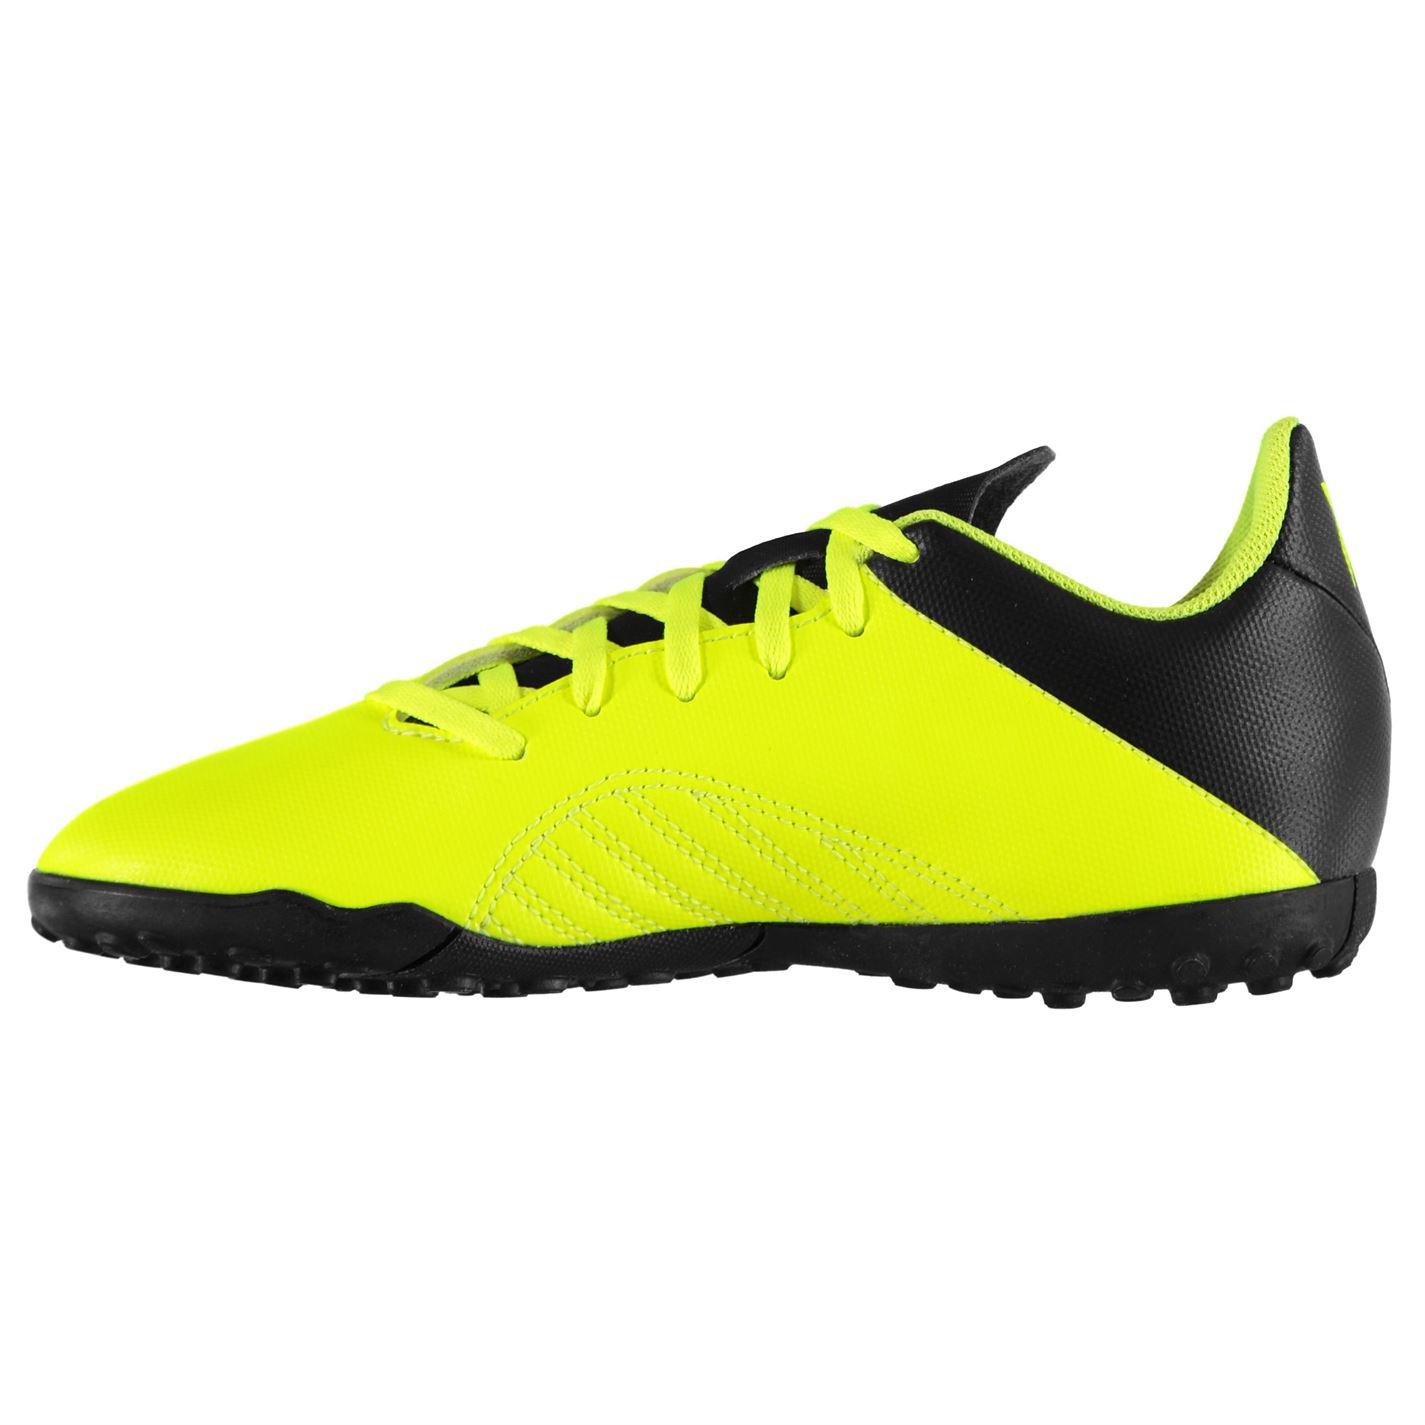 7faef2a2a4fa4 adidas Kids Boys X Tango 18.4 Junior Astro Turf Trainers Football ...